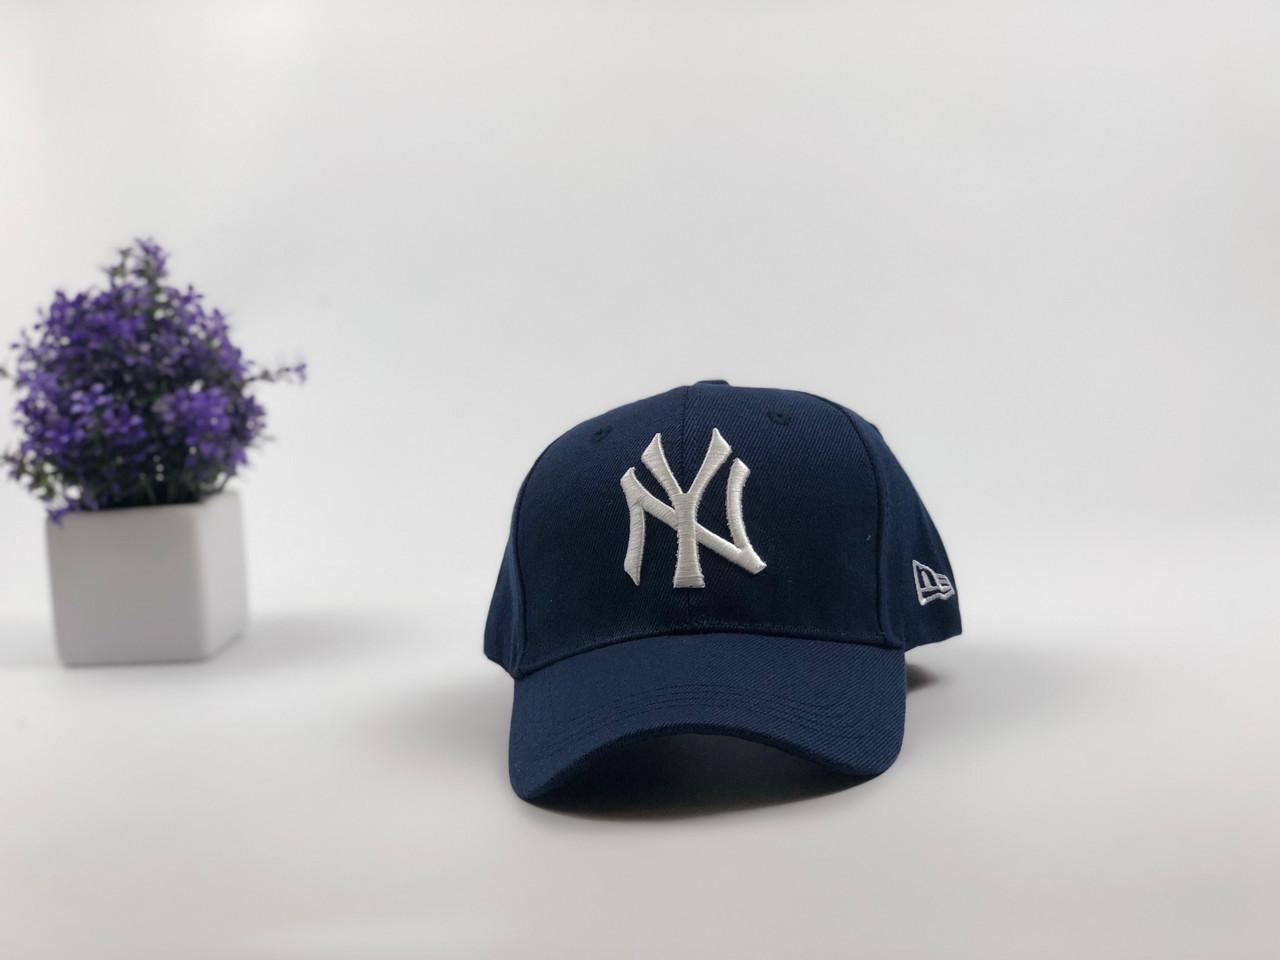 Кепка бейсболка New York Yankees (темно-синяя)